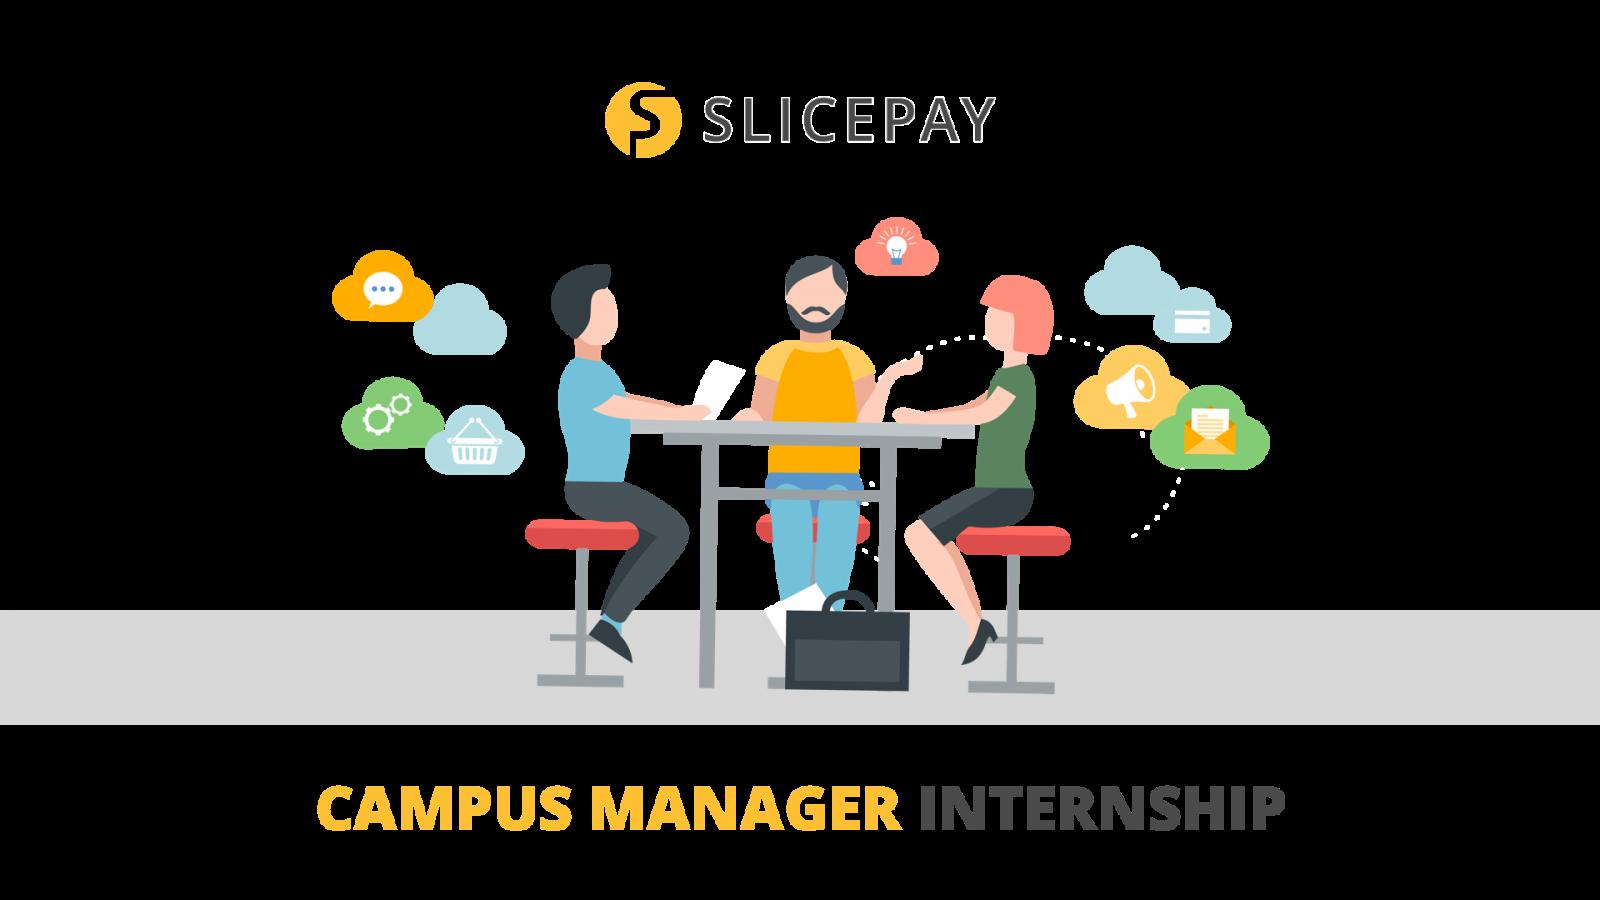 May slicepay blog earn. Working clipart work hour